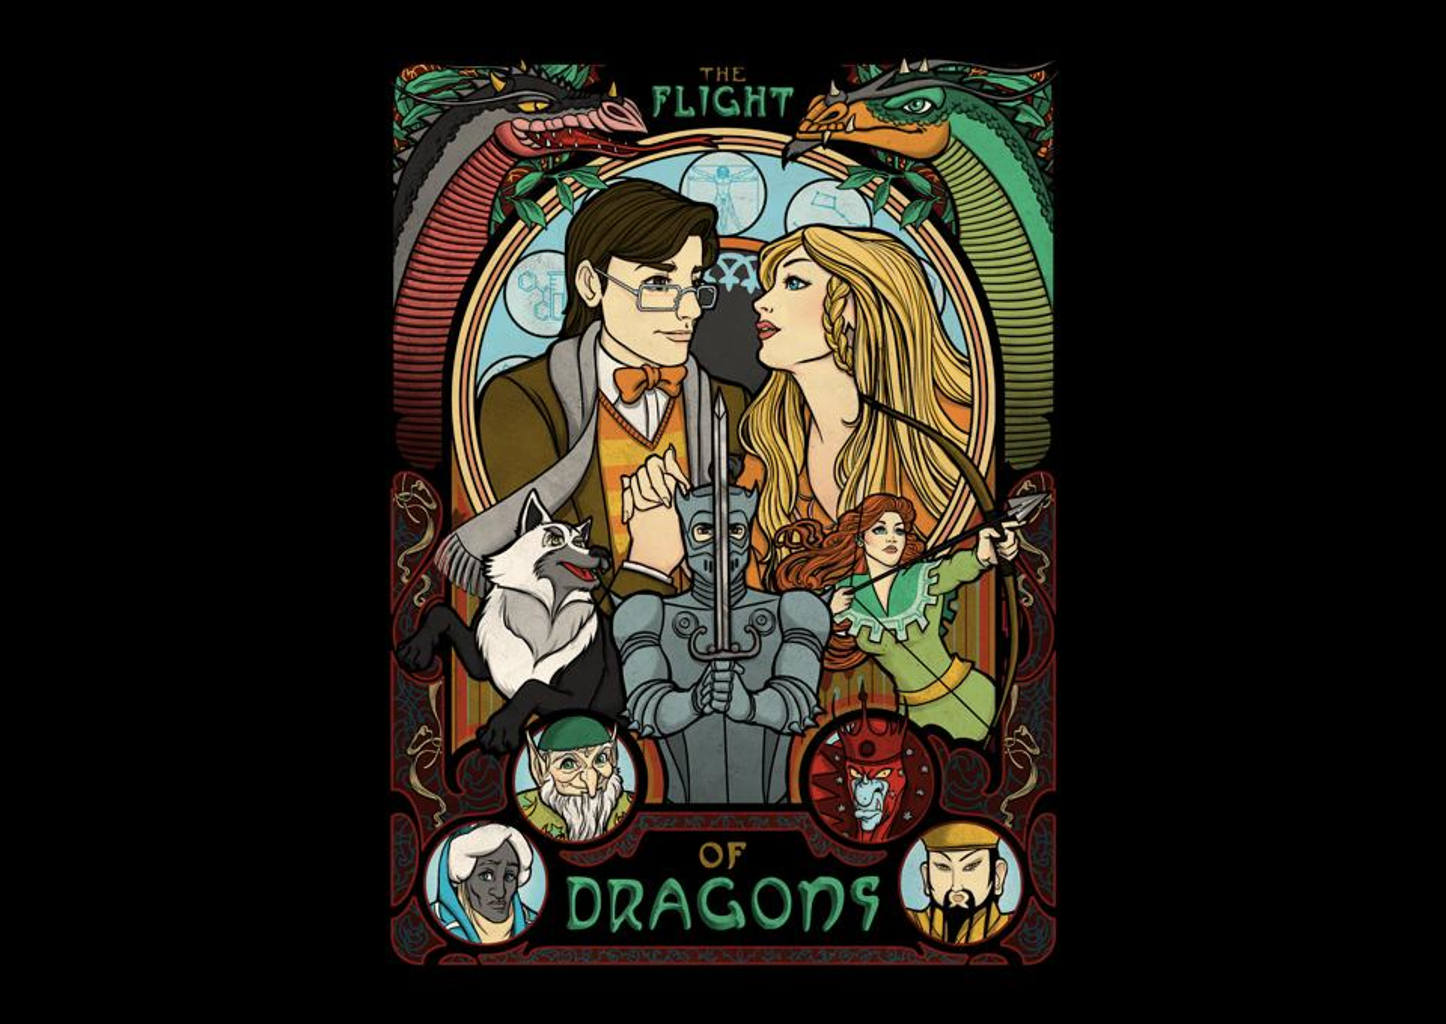 TeeFury: The Flight of Dragons